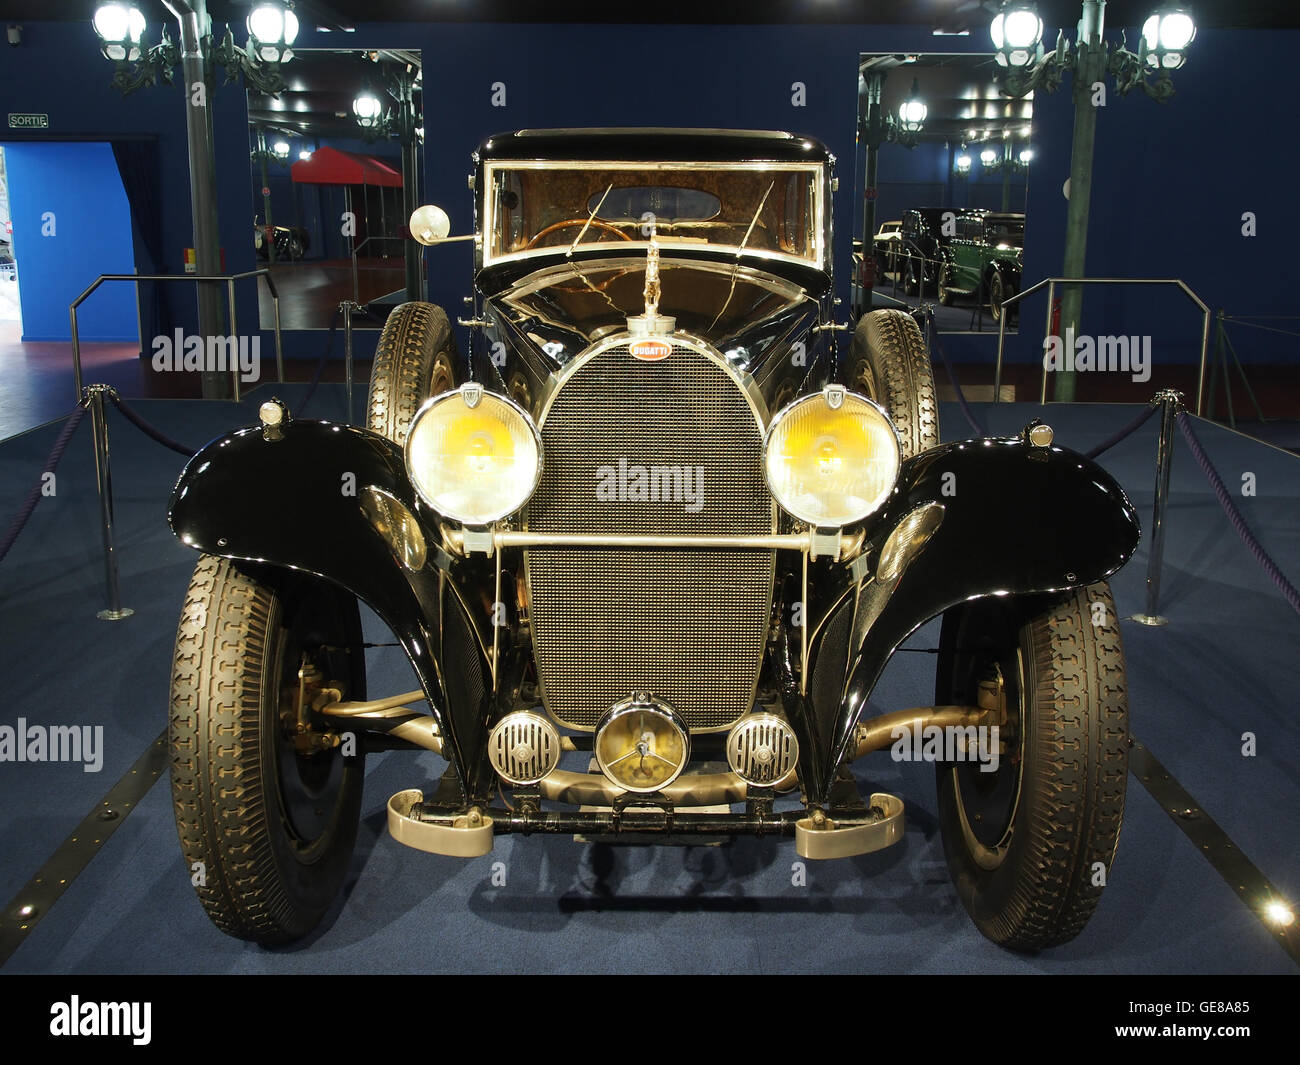 1933 Bugatti Limousine TType 41 Royale, 300cv 12763cc 180kmh (MNA 0913) photo 2 - Stock Image